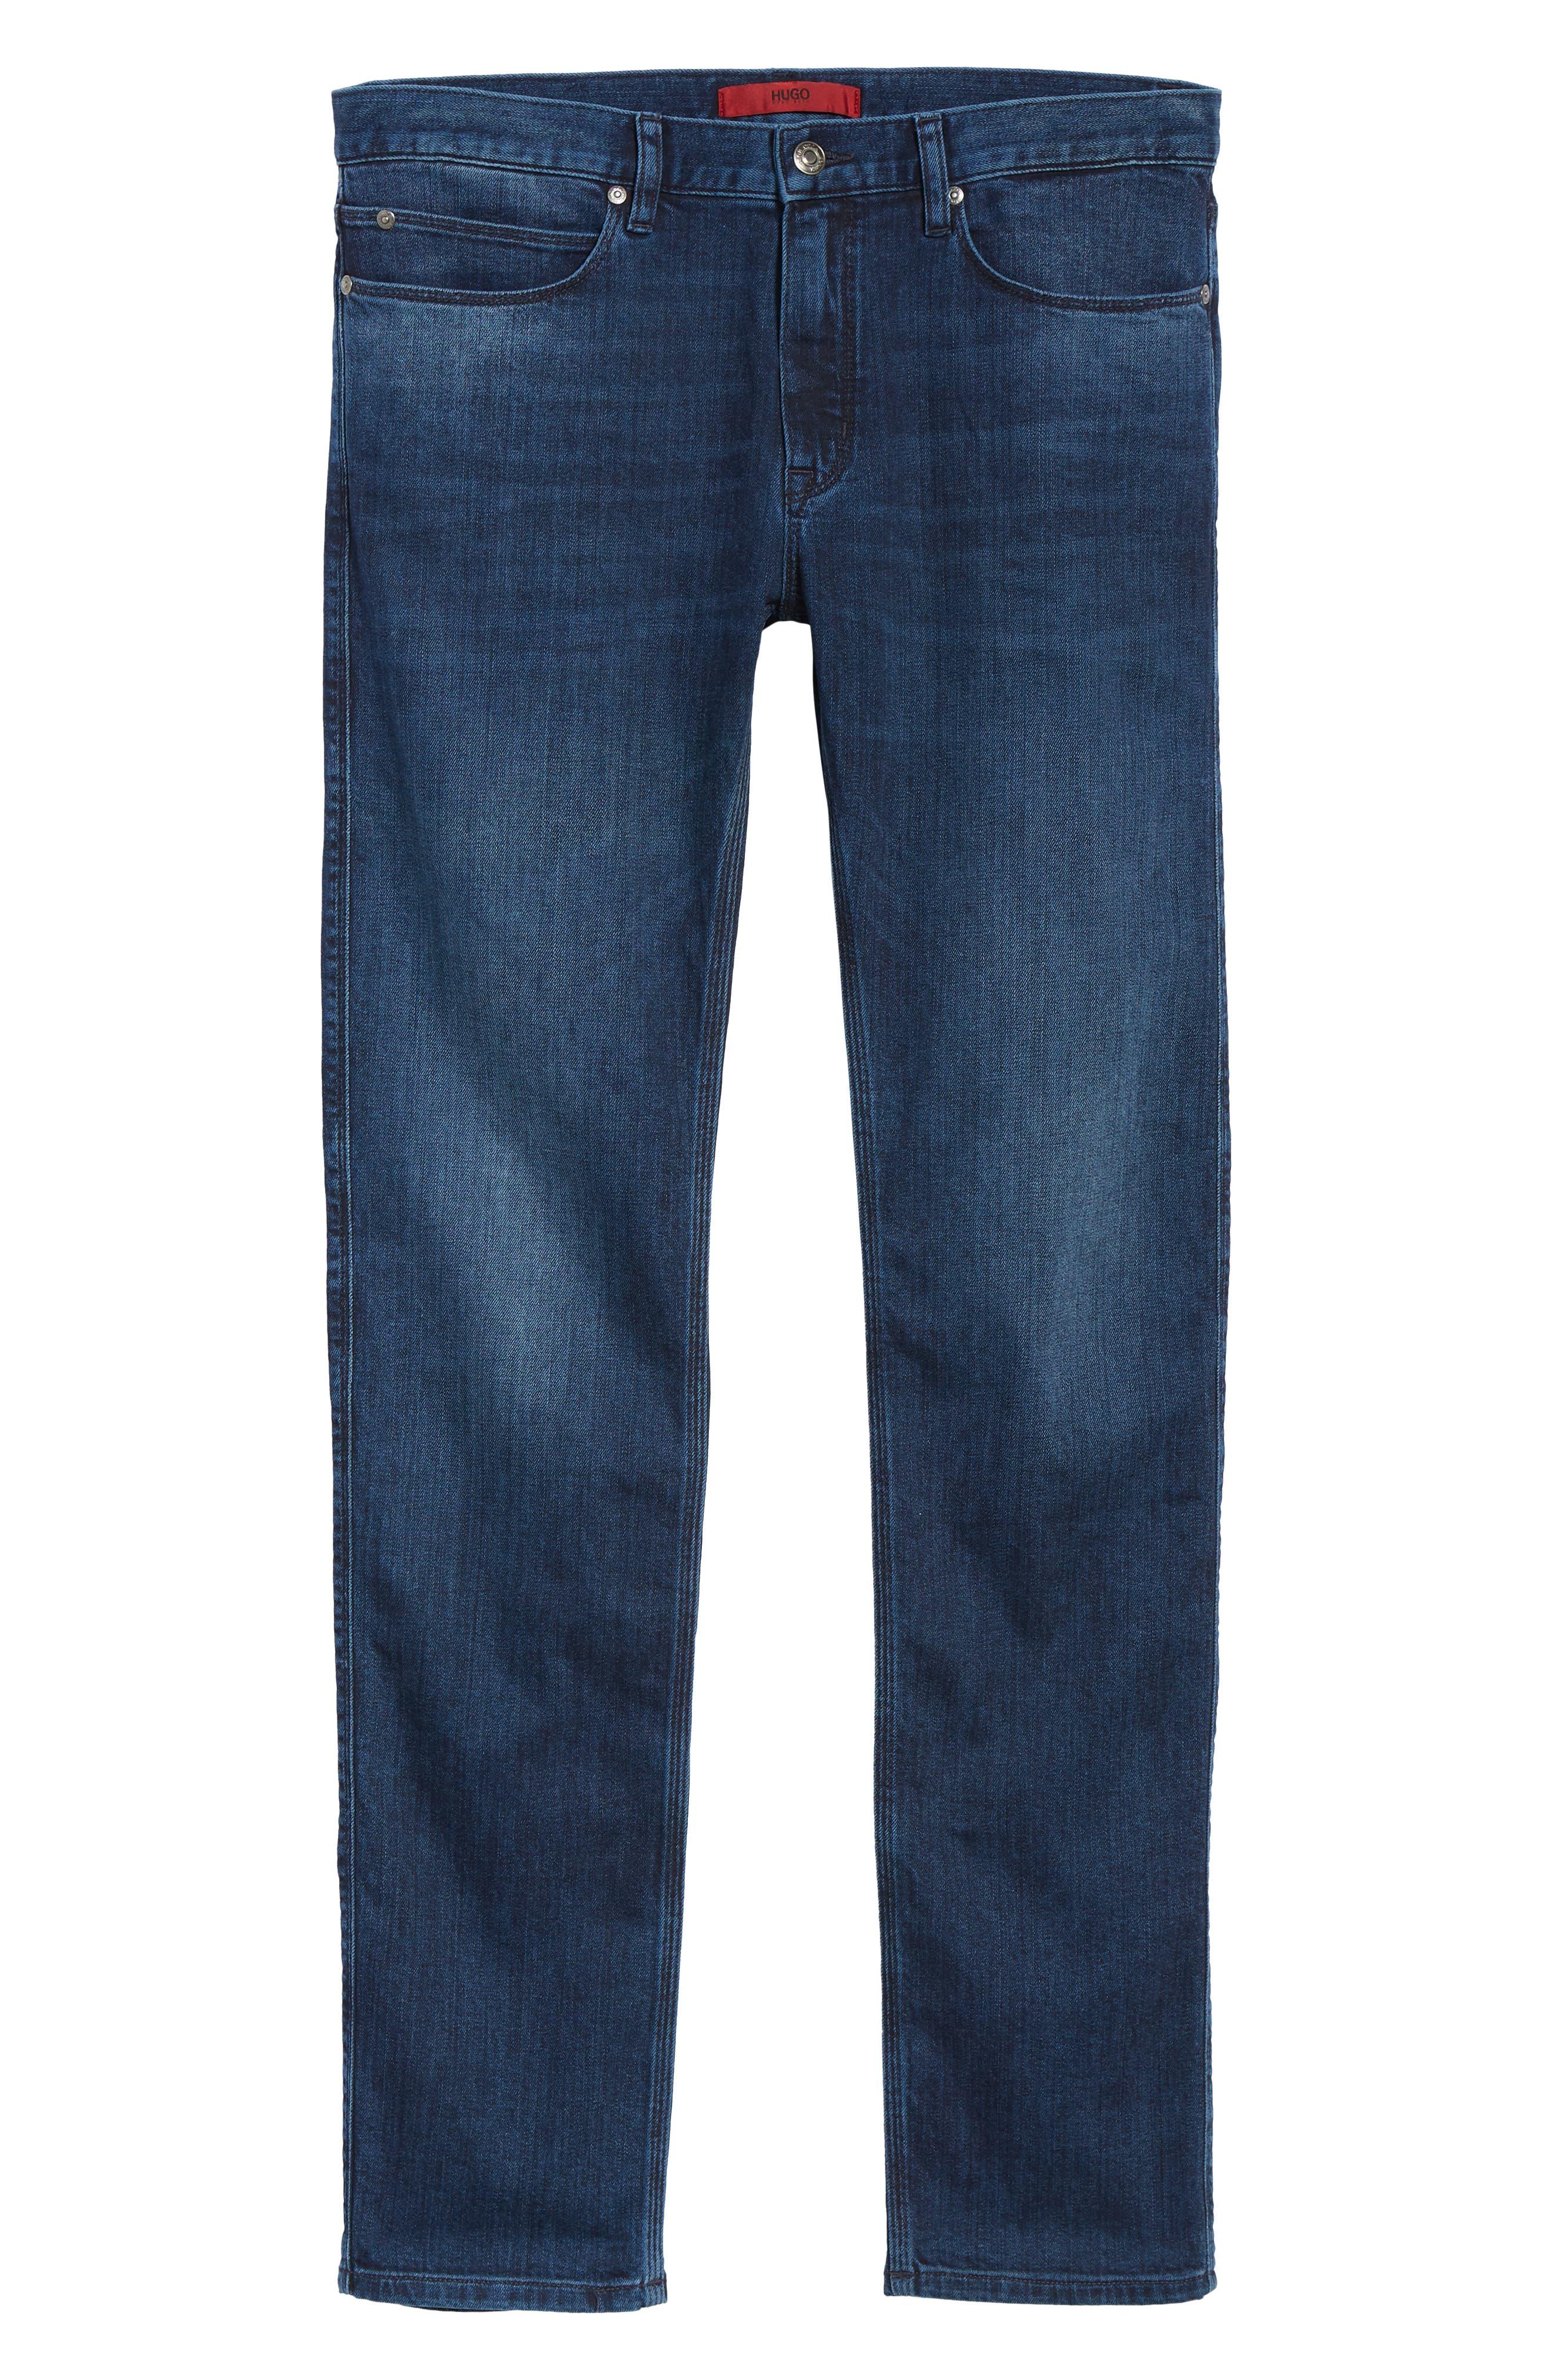 708 Stretch Slim Fit Jeans,                             Alternate thumbnail 6, color,                             420